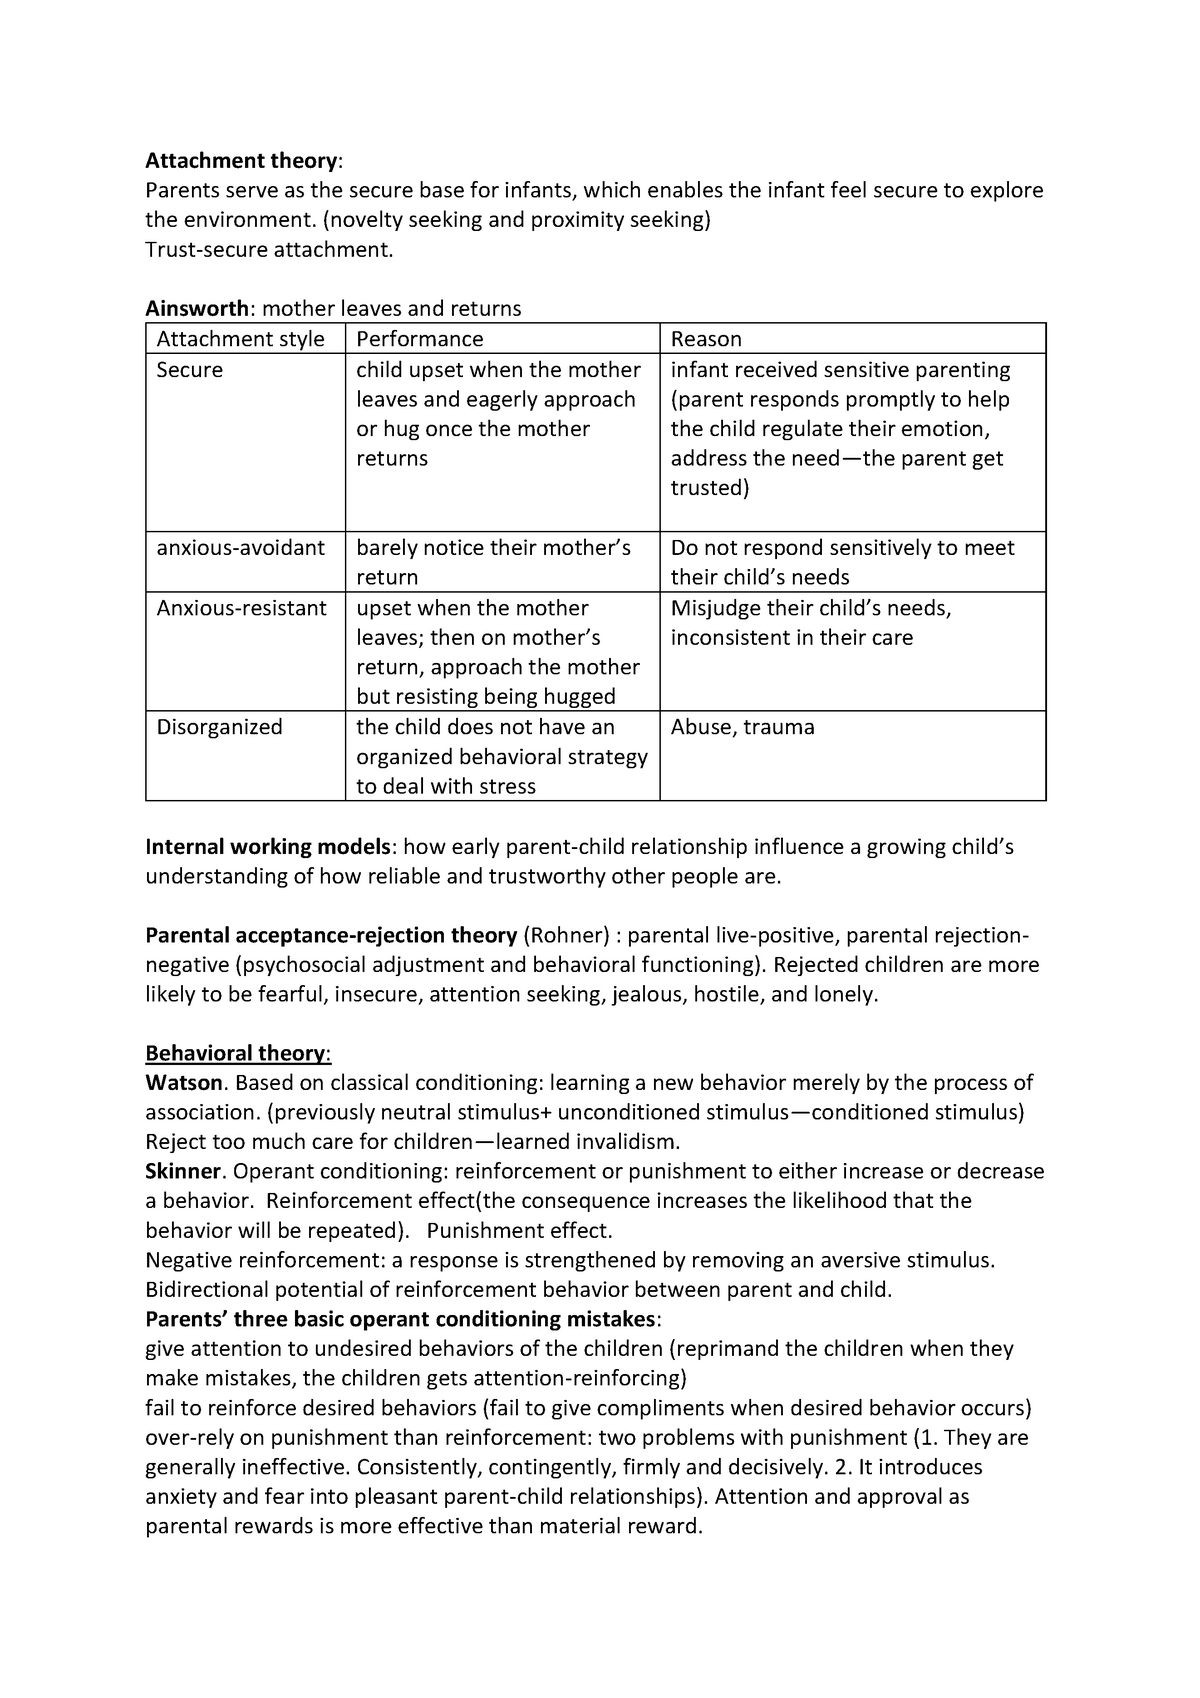 Exam #1 review - Parent-Child Relations INTS 321 - StuDocu